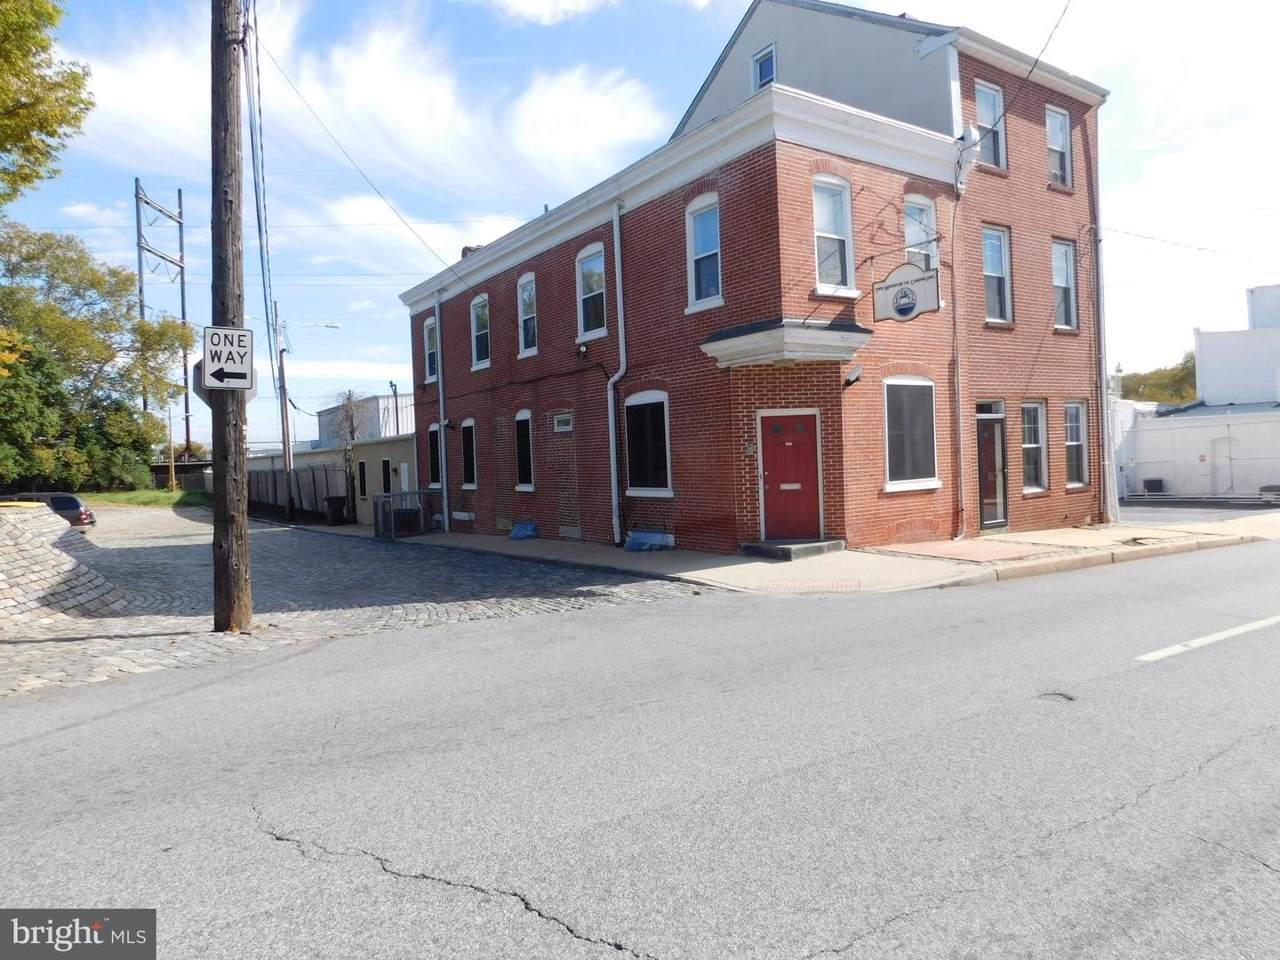 506 Church Street - Photo 1